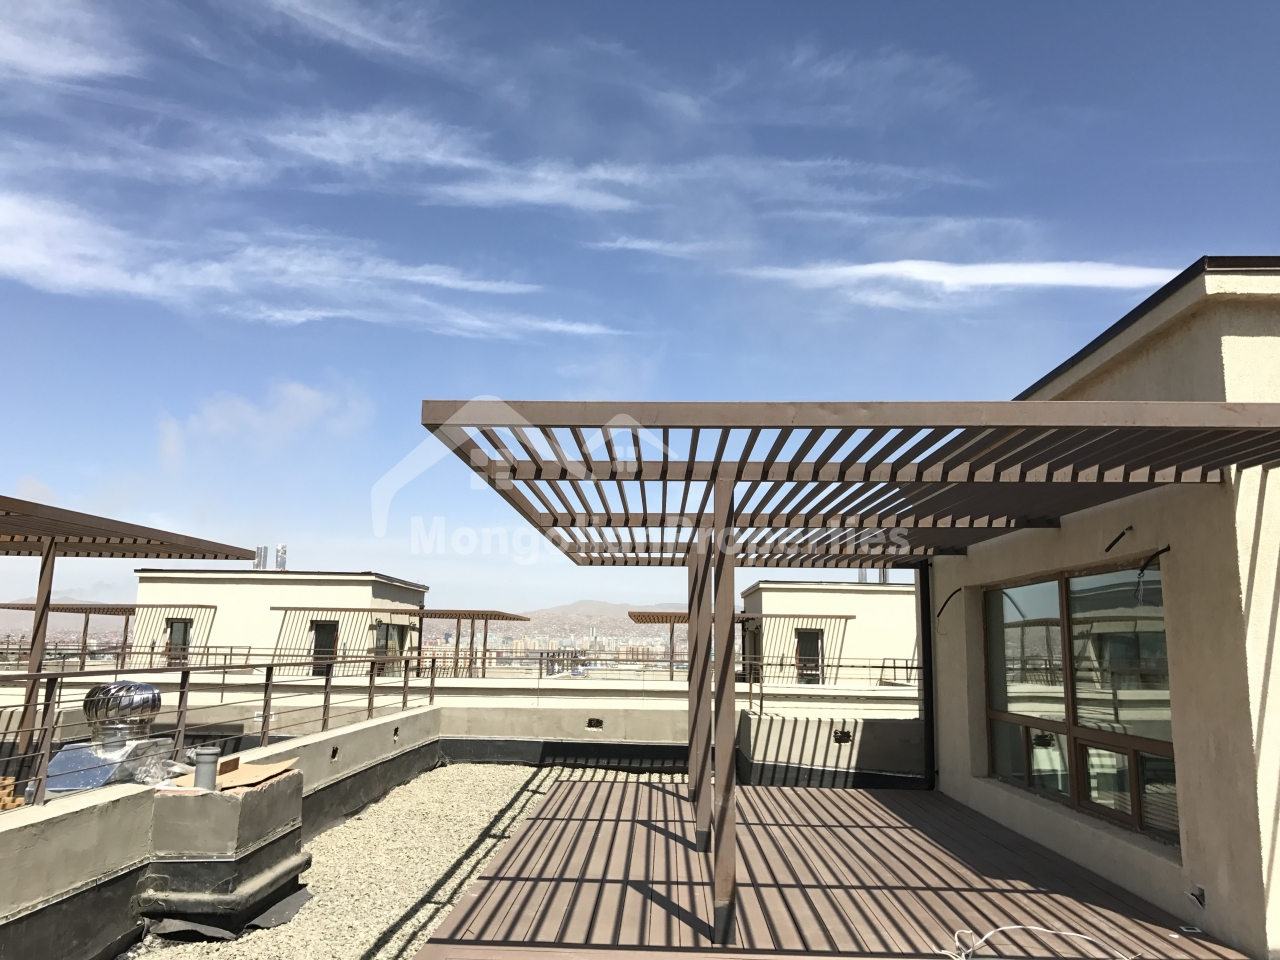 For SALE: Khiimori Luxury Townhouse, Showroom #2, B3, 258.7m2, 3br, 4bath, 2 garages